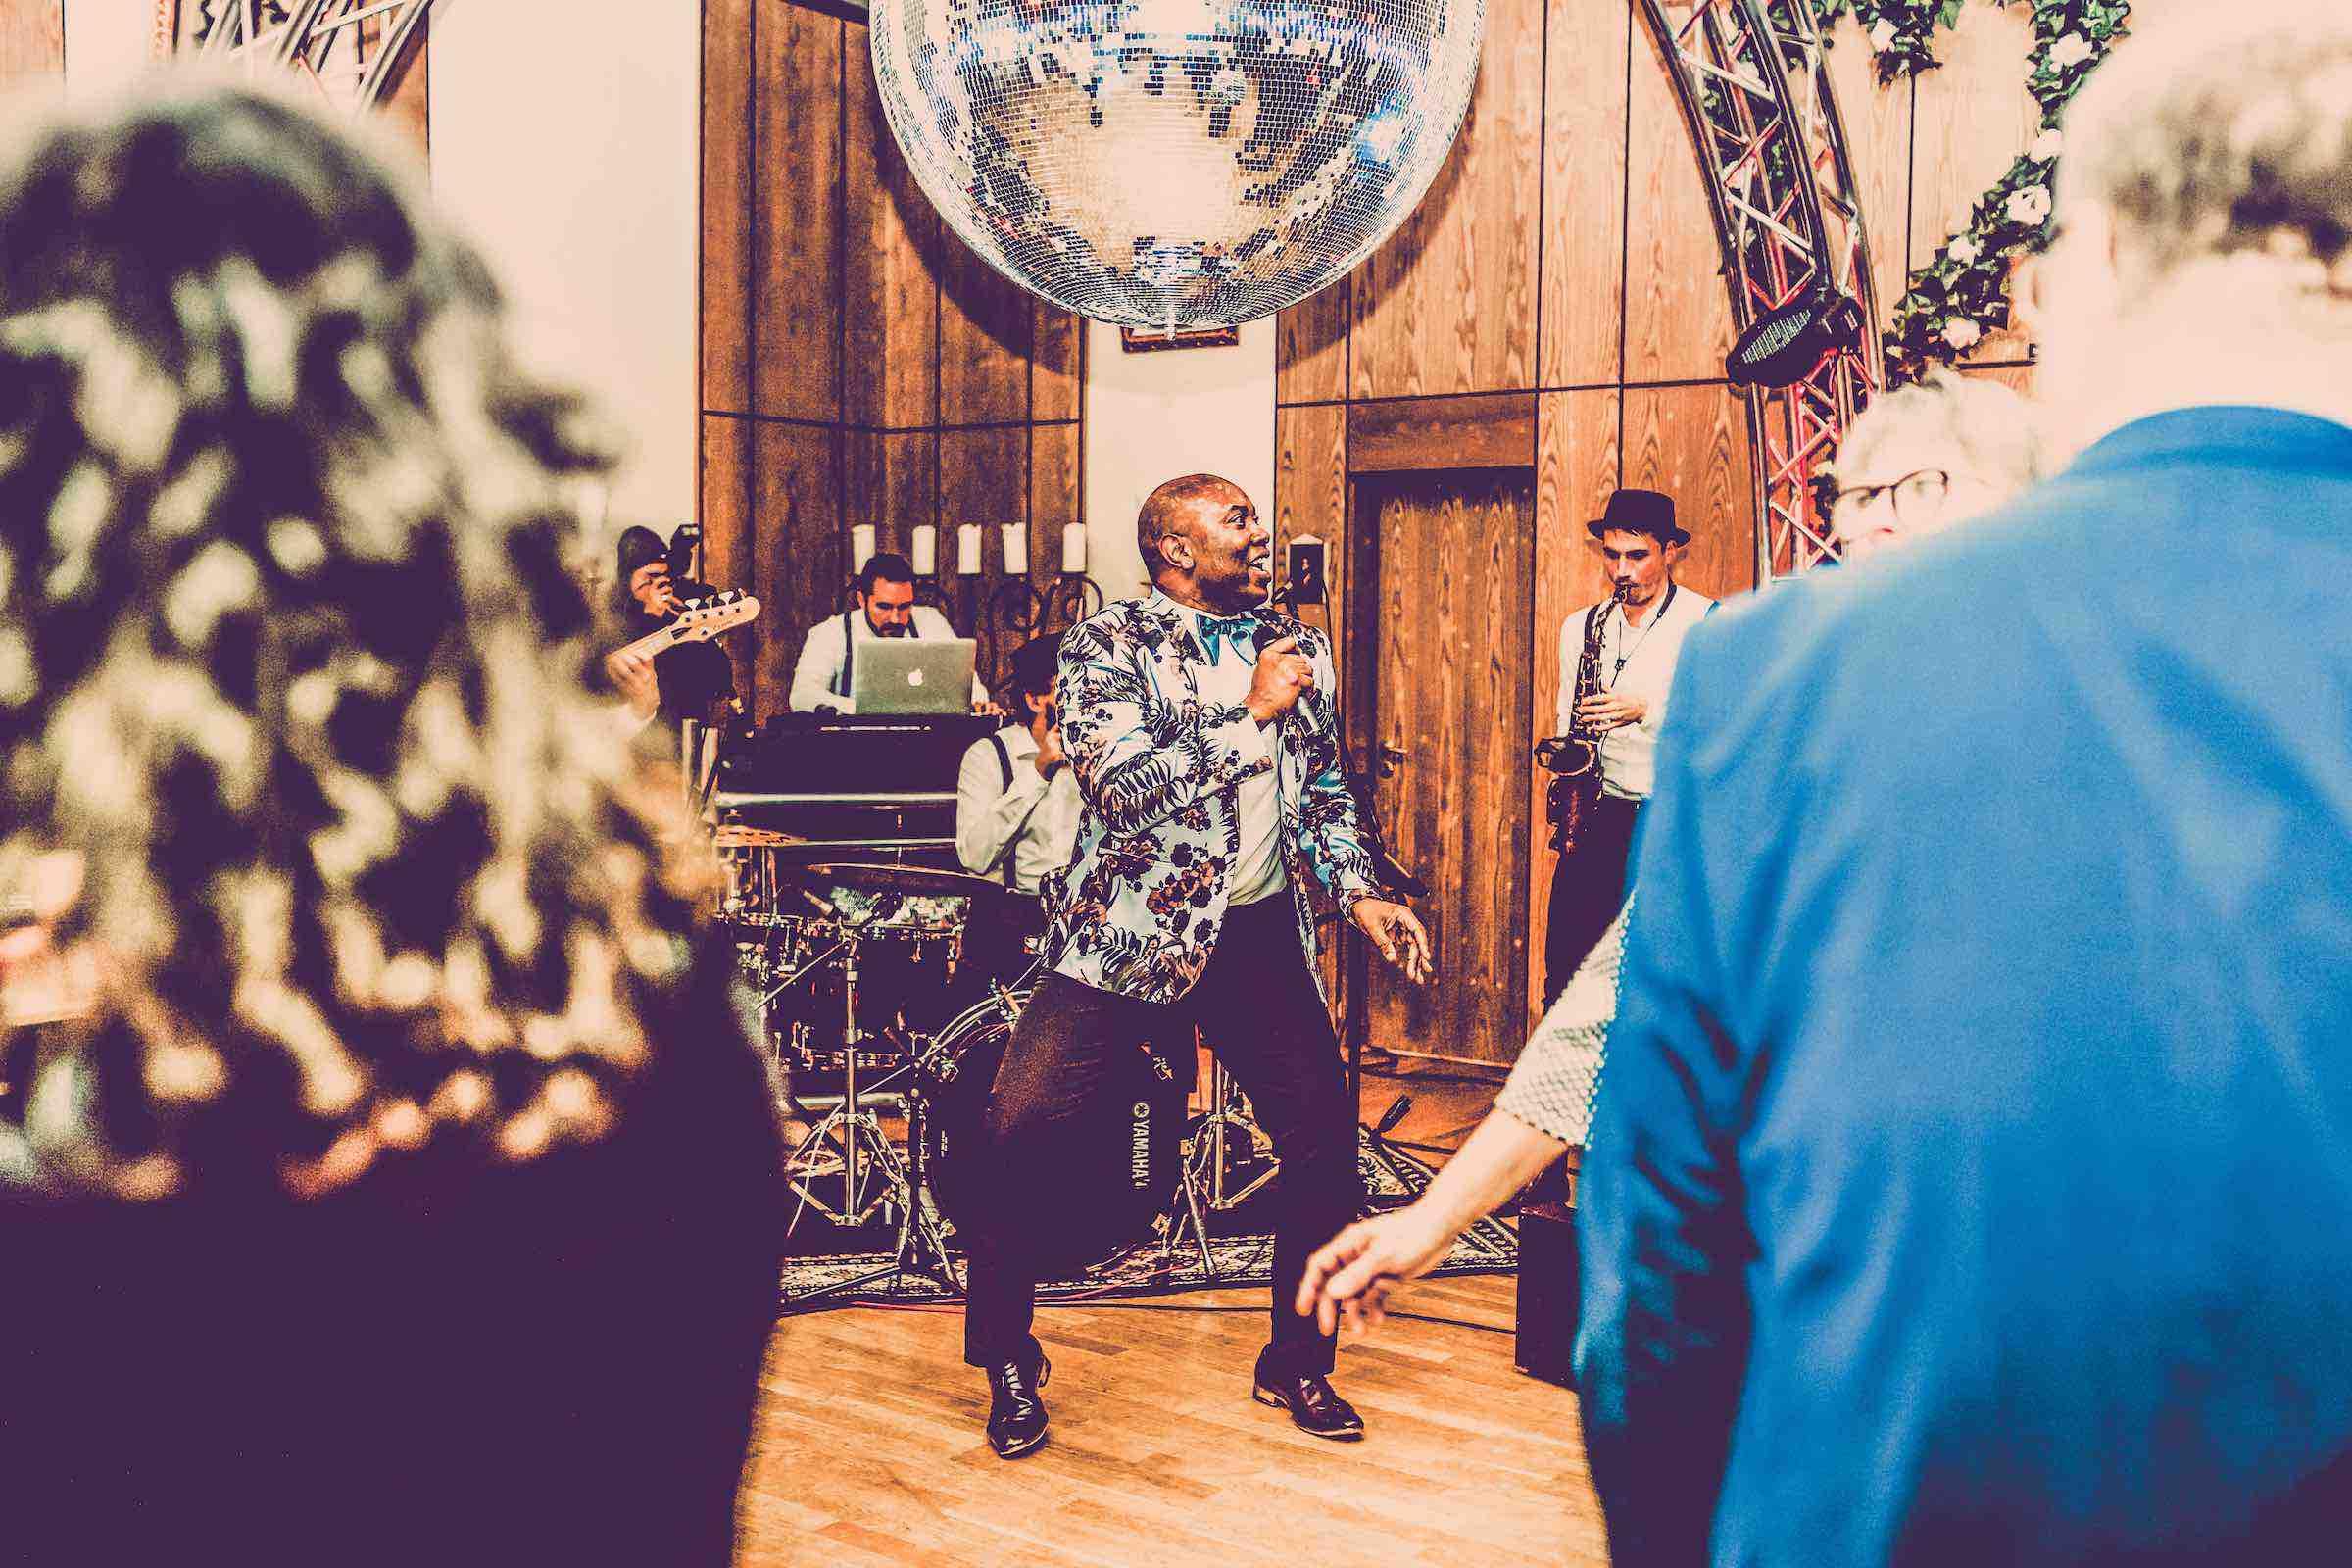 Band | Hamburg | Liveband | Partyband | Jazzband | Swingband | Lounge | Pop | Jazz | Sänger | Frontsänger | Johnny Tune | Hochzeit | Standesamt | Trauung | Firmenfeier | Charity | Gala | Buchen | Mieten | Anfragen | Hamburgfeiert